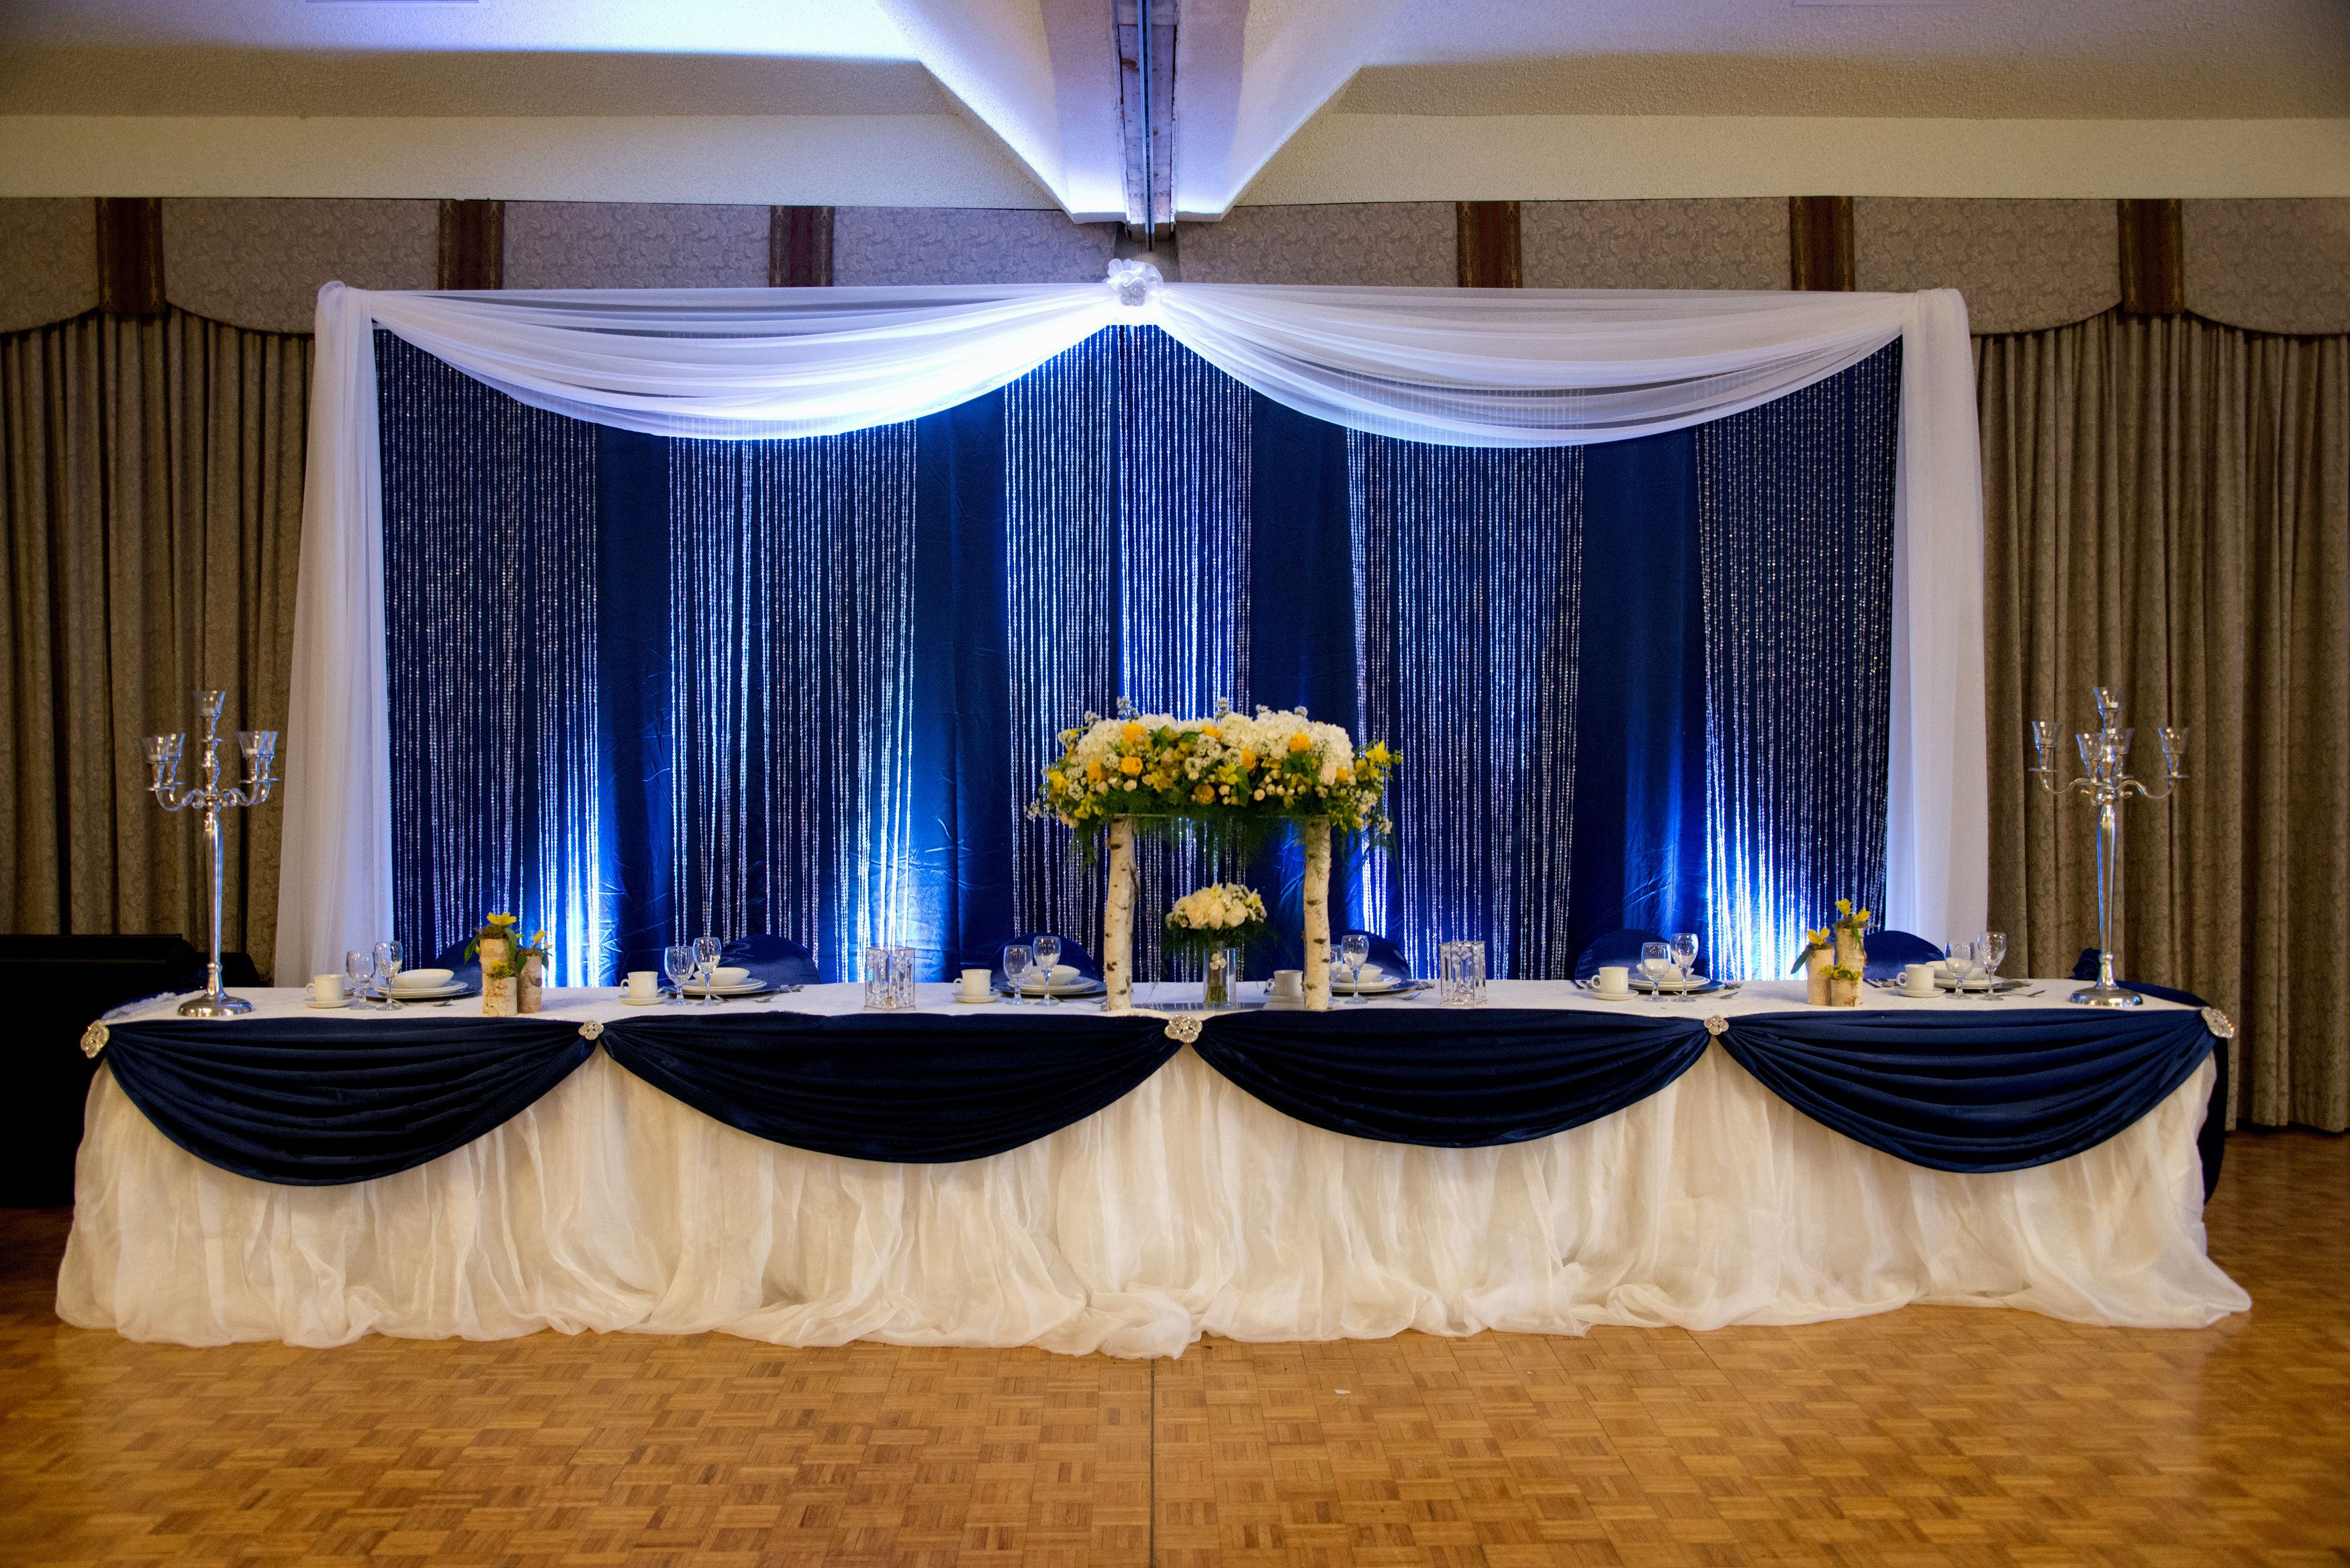 head table decoration - Google Search   wedding ideas   Pinterest ...